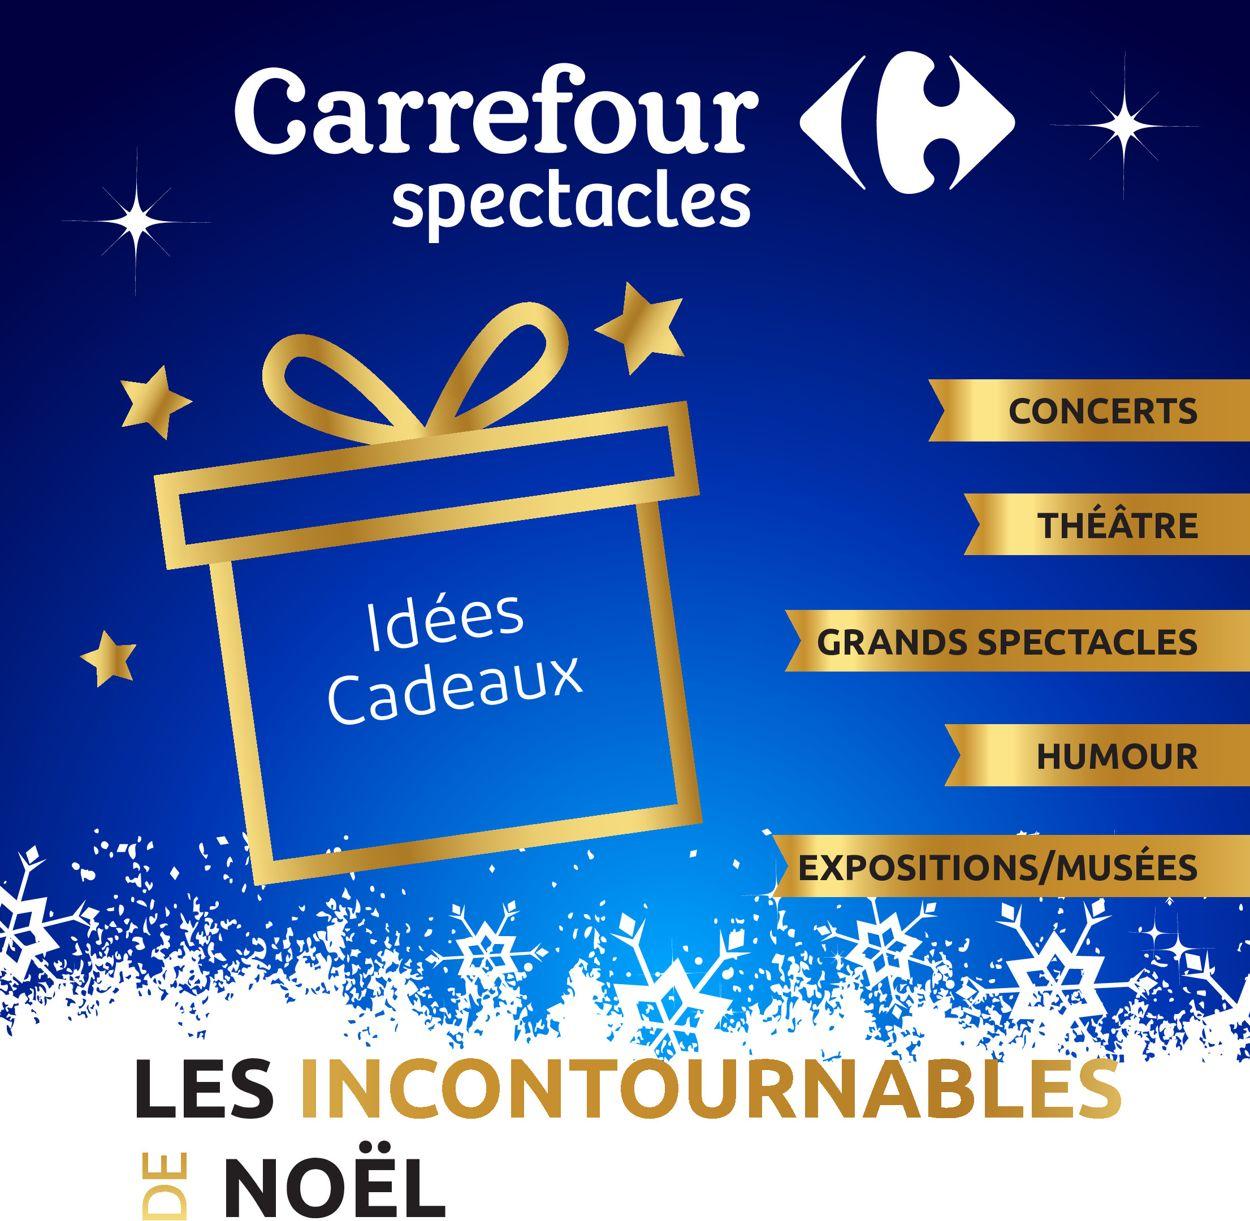 Carrefour - catalogue de Noël 2019 Catalogue - 05.12-25.12.2019